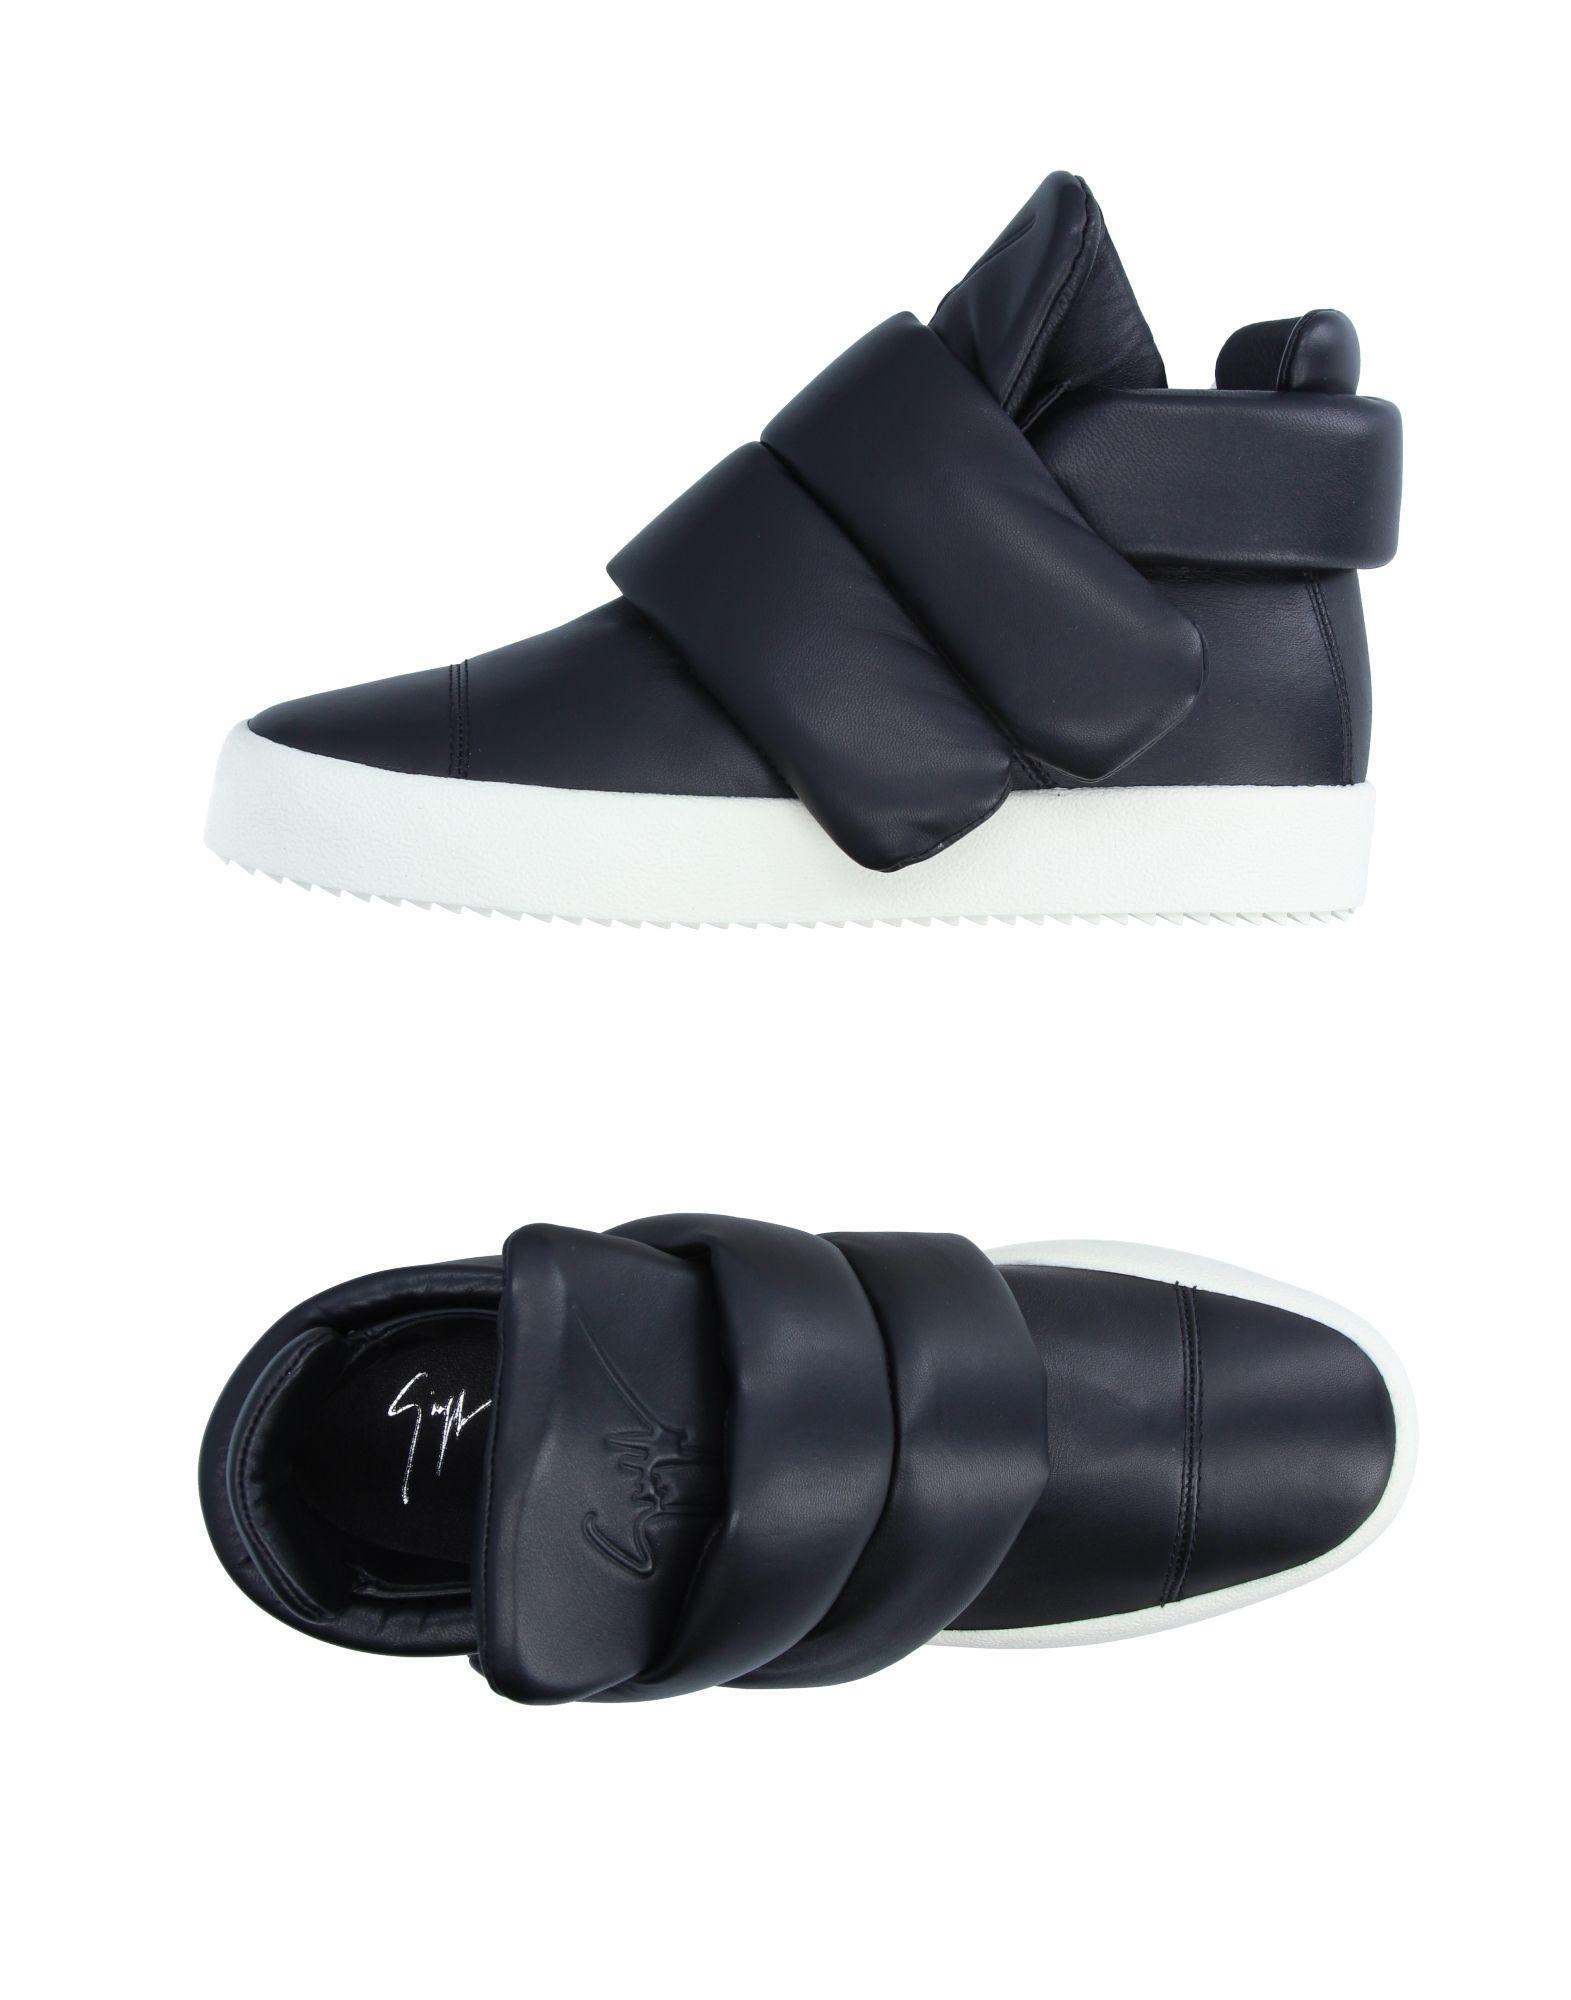 Giuseppe Zanotti Sneakers Herren  11311482FM Gute Qualität beliebte Schuhe